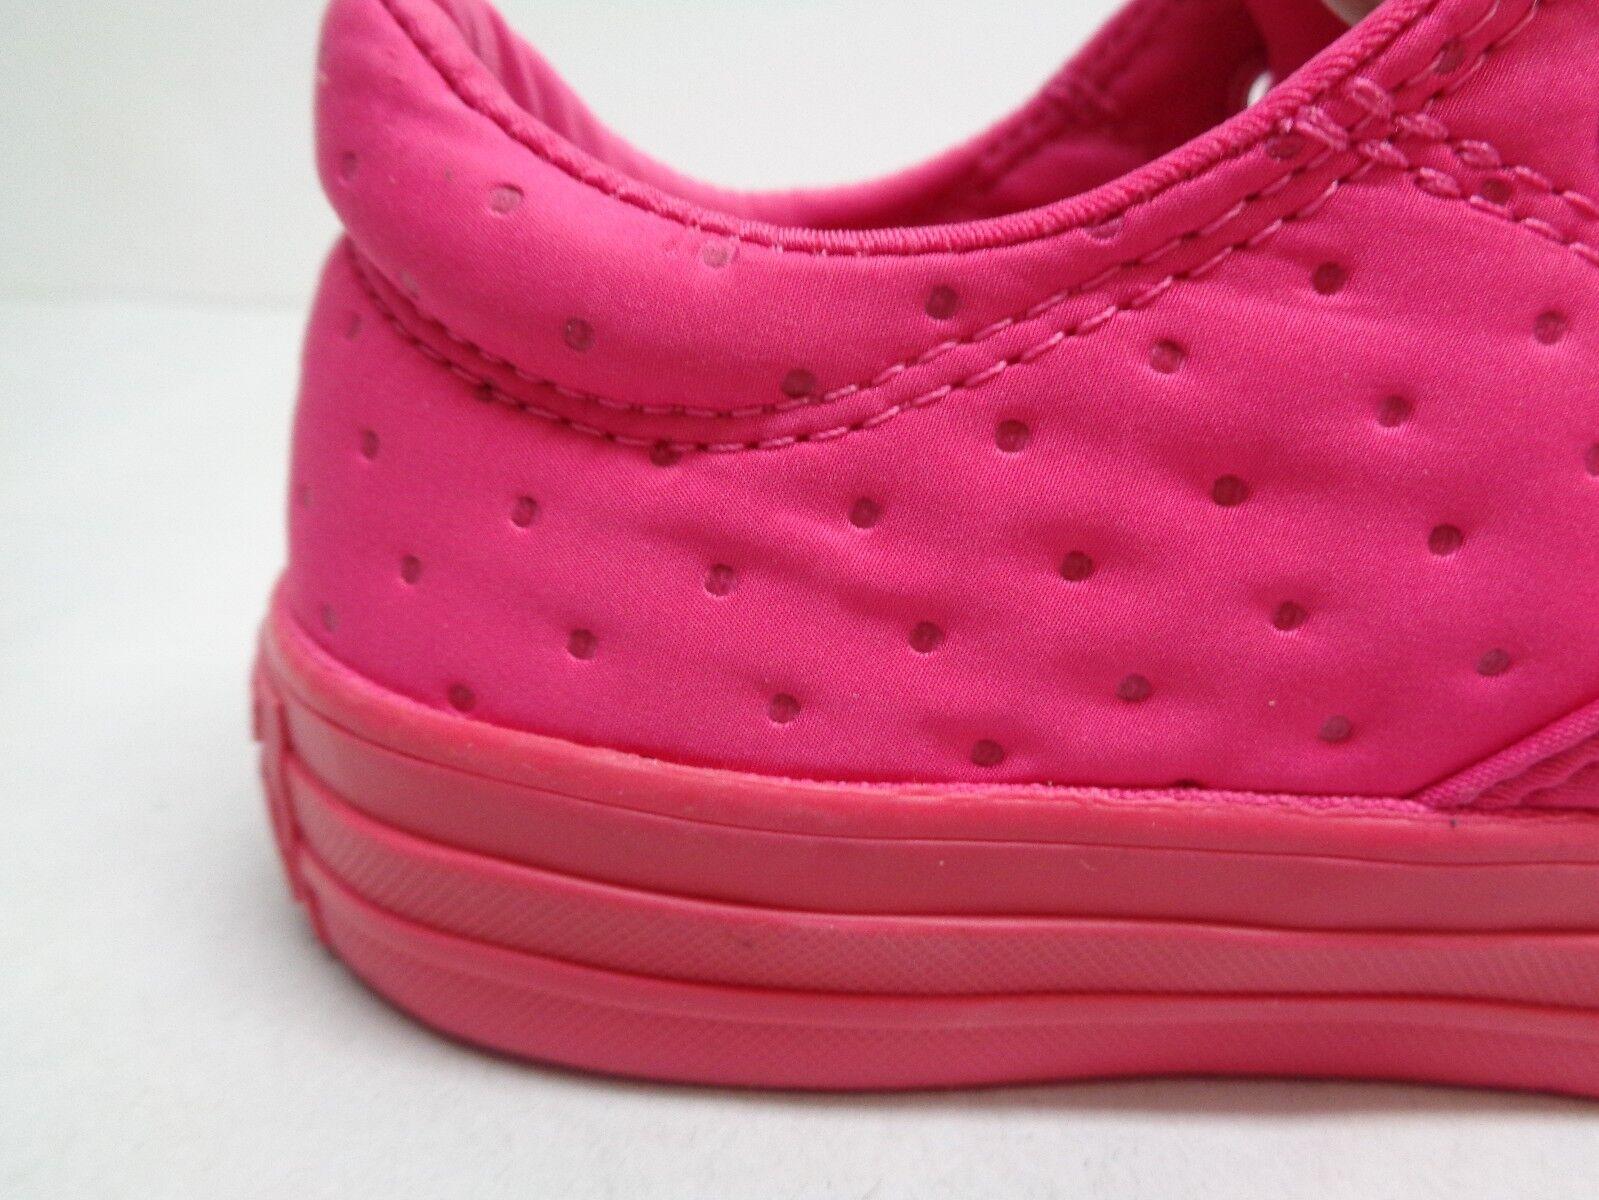 Converse All Star 6 Größe 6 Star MADISON Vivid Pink Fashion Sneakers New Damenschuhe Schuhes 6aee44